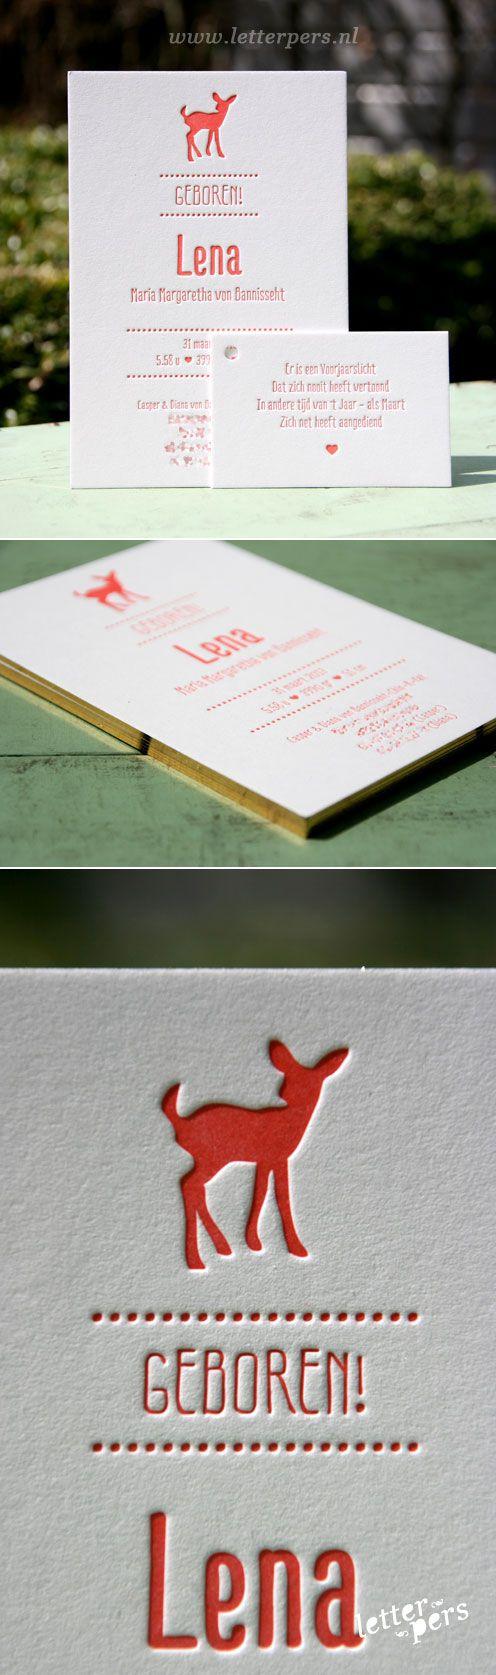 letterpers_letterpress_Lena_geboortekaartje_hertje_goud_op_snede_folie_koraalrood